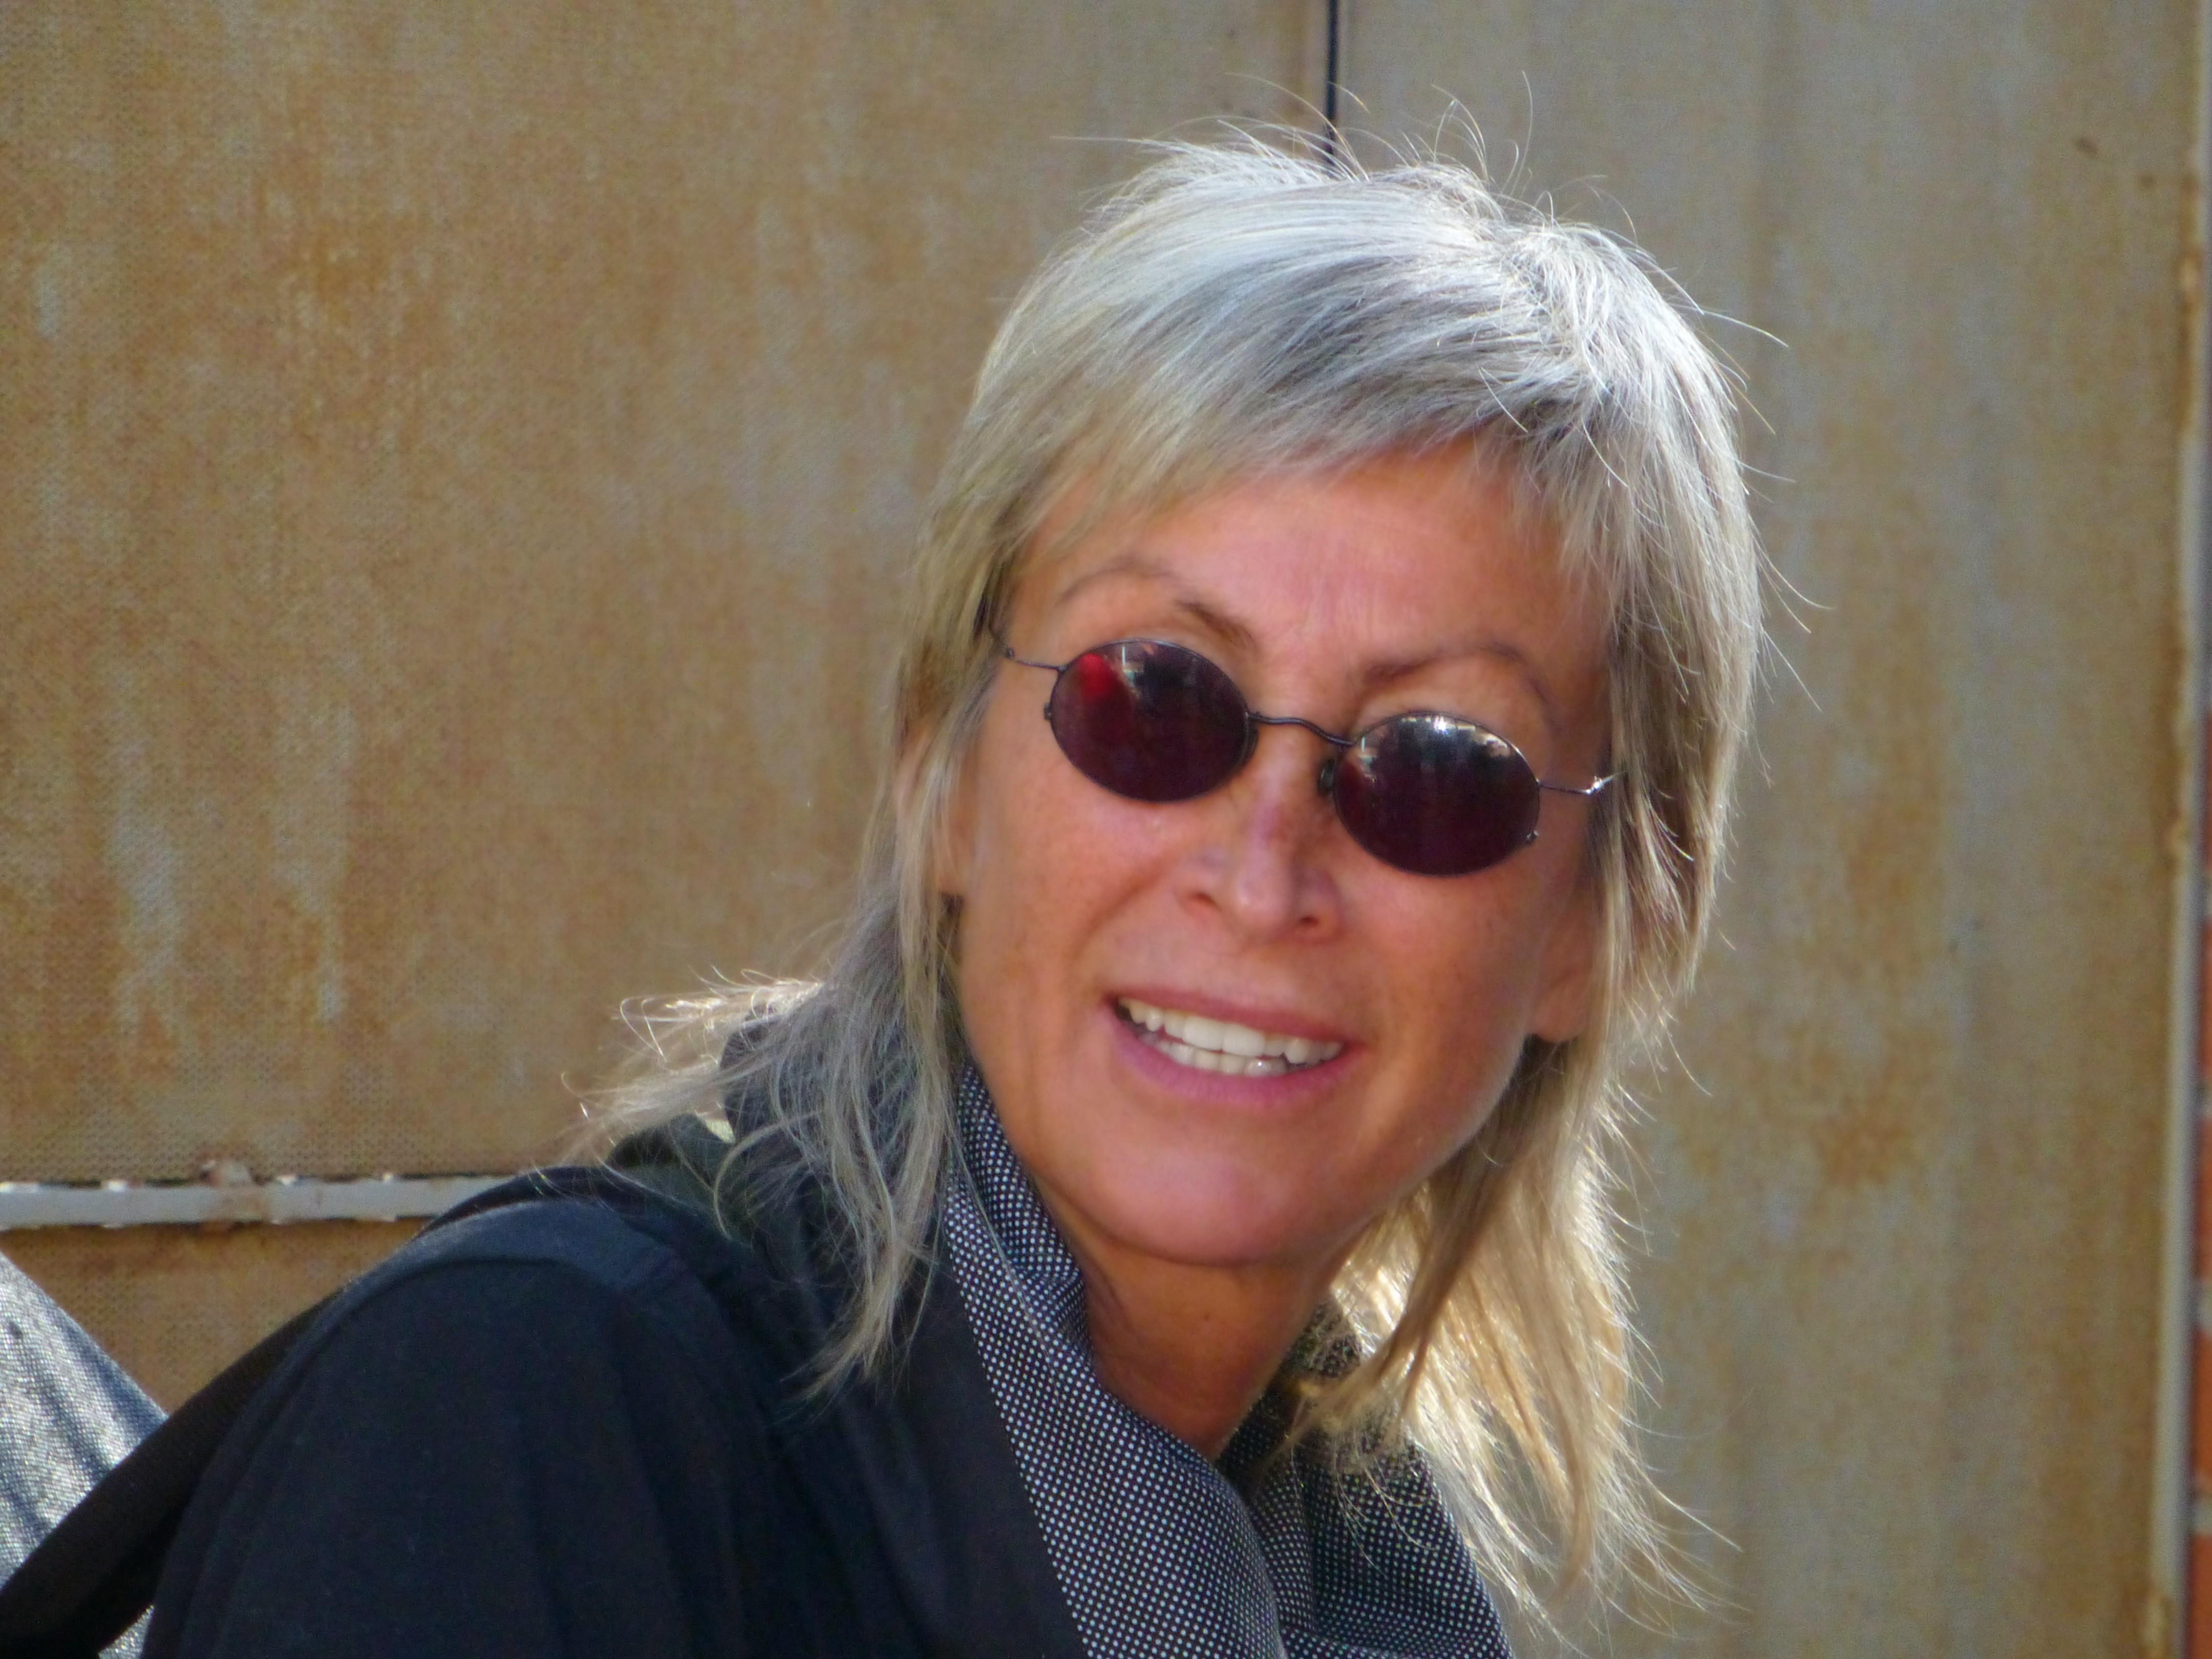 B_Marina GARIBOLDI_Portrait